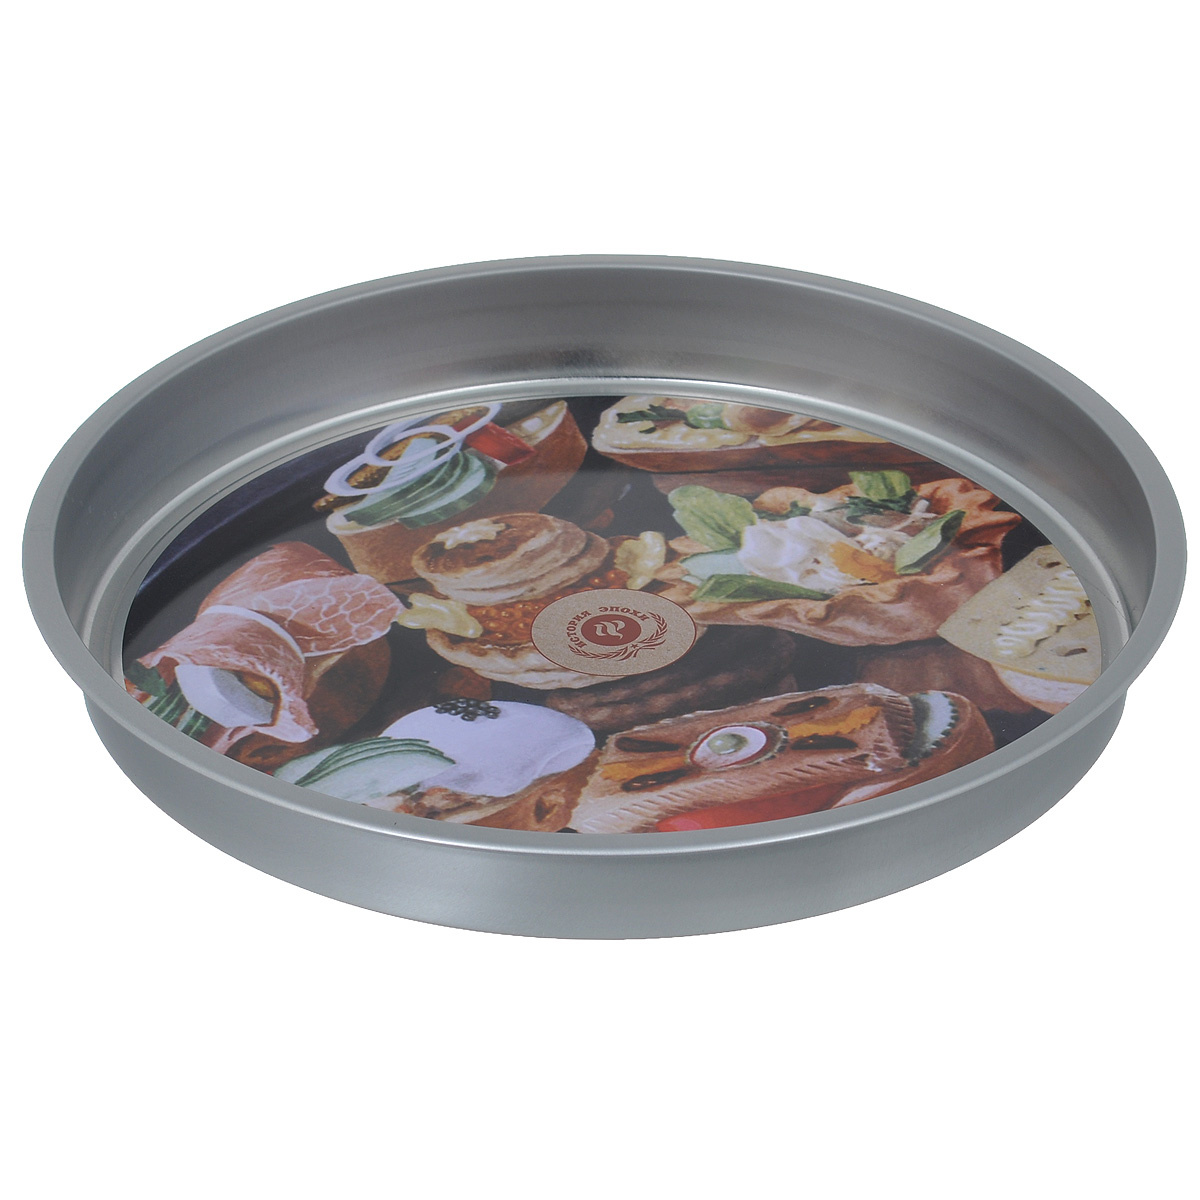 Поднос Феникс-Презент Бутерброды, диаметр 33 см сувенир феникс поднос столик ретро канцелярия 41 28 6см